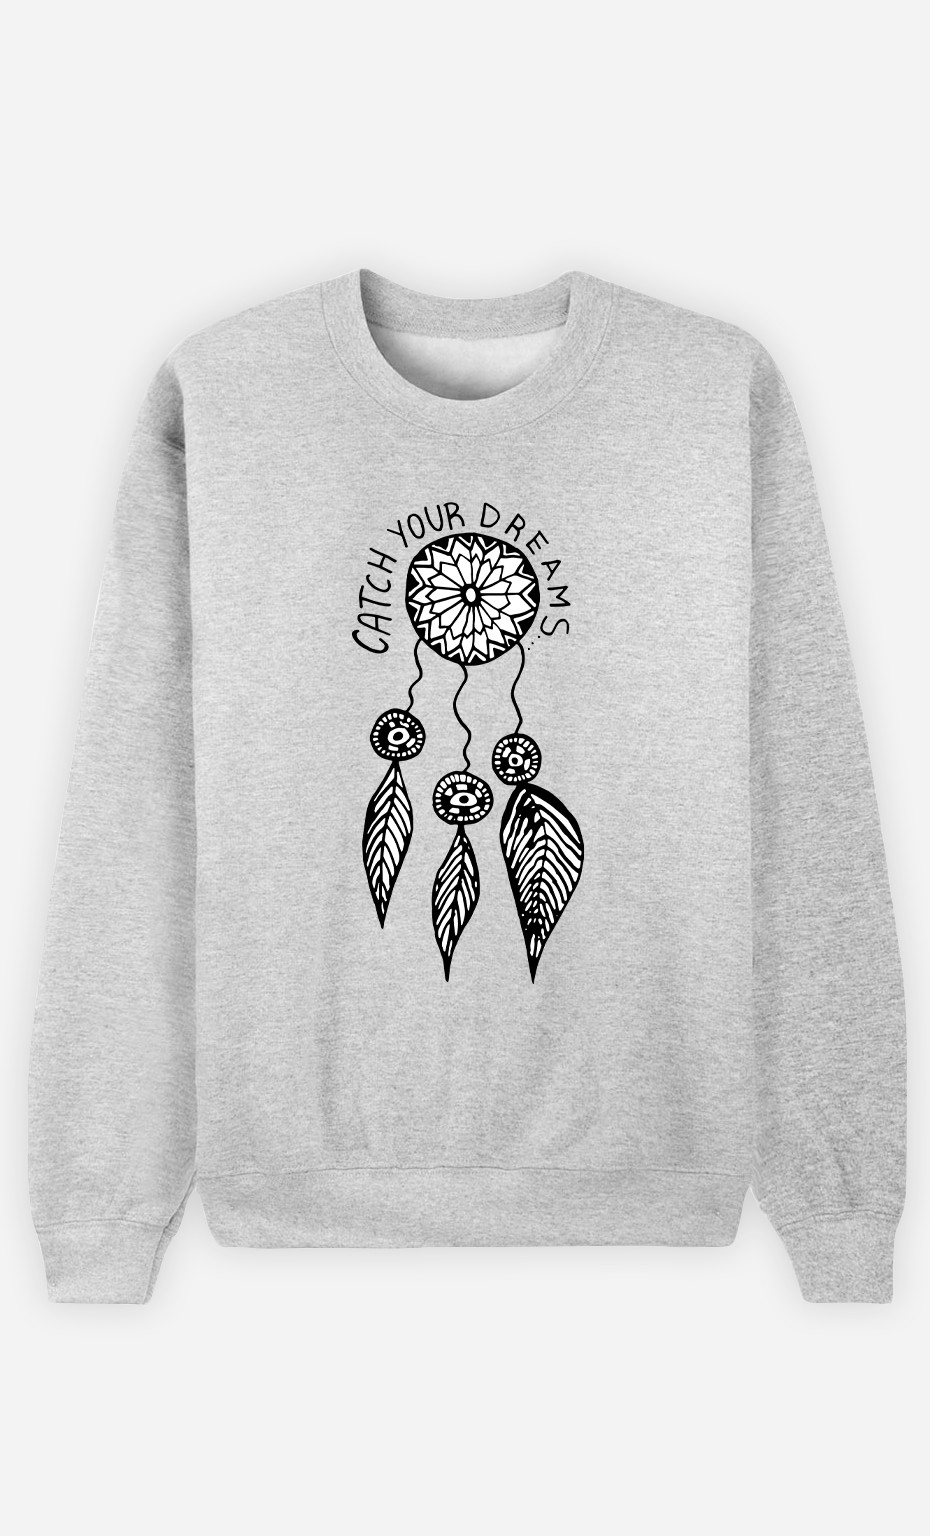 Man Sweatshirt Catch Your Dreams